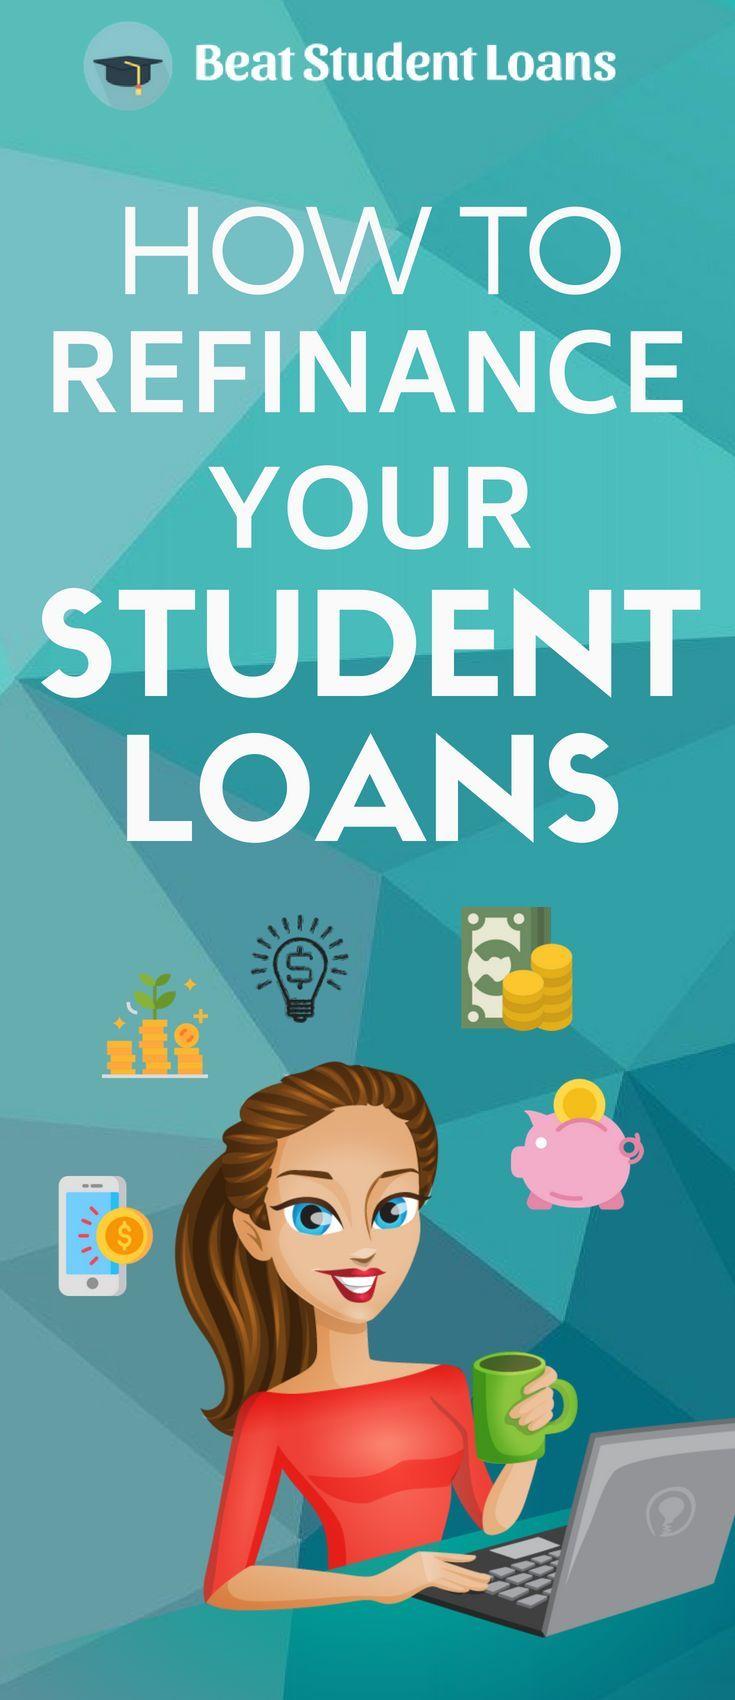 Refinance Student Loans Reddit Top Lenders 2020 Beat Student Loans Student Loans Paying Off Student Loans Refinance Student Loans